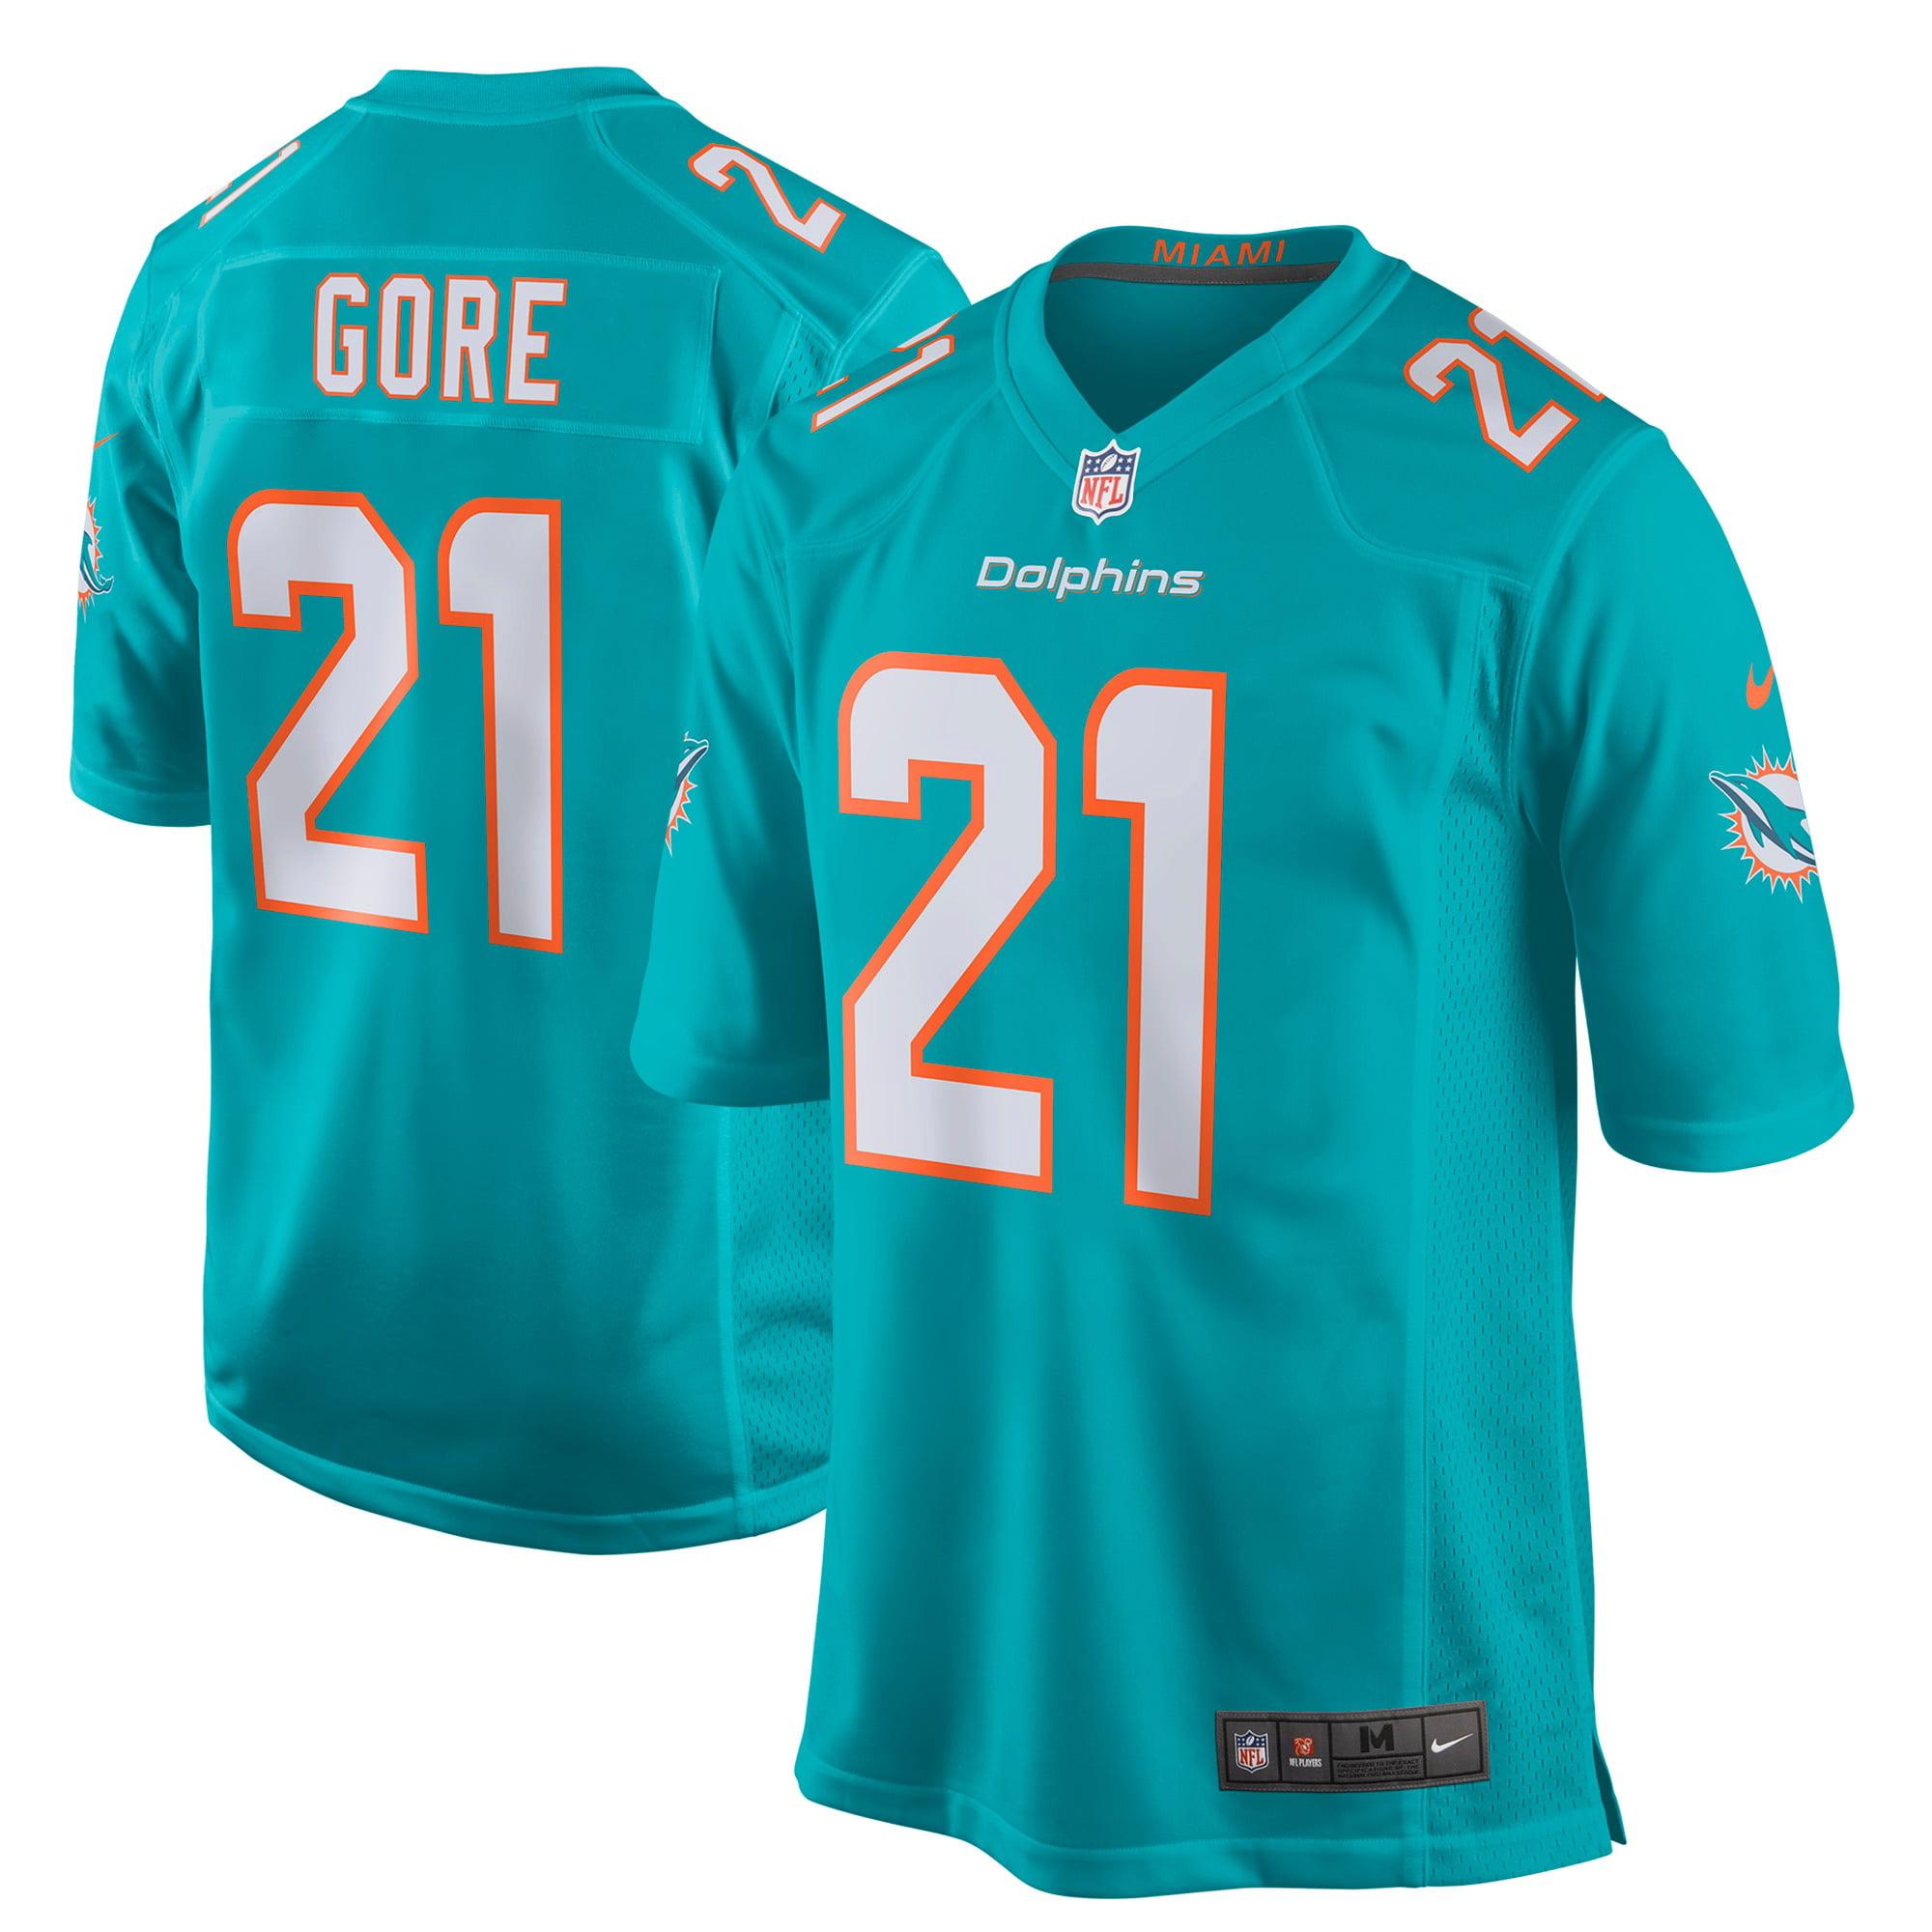 Frank Gore Miami Dolphins Nike New 2018 Game Jersey - Aqua